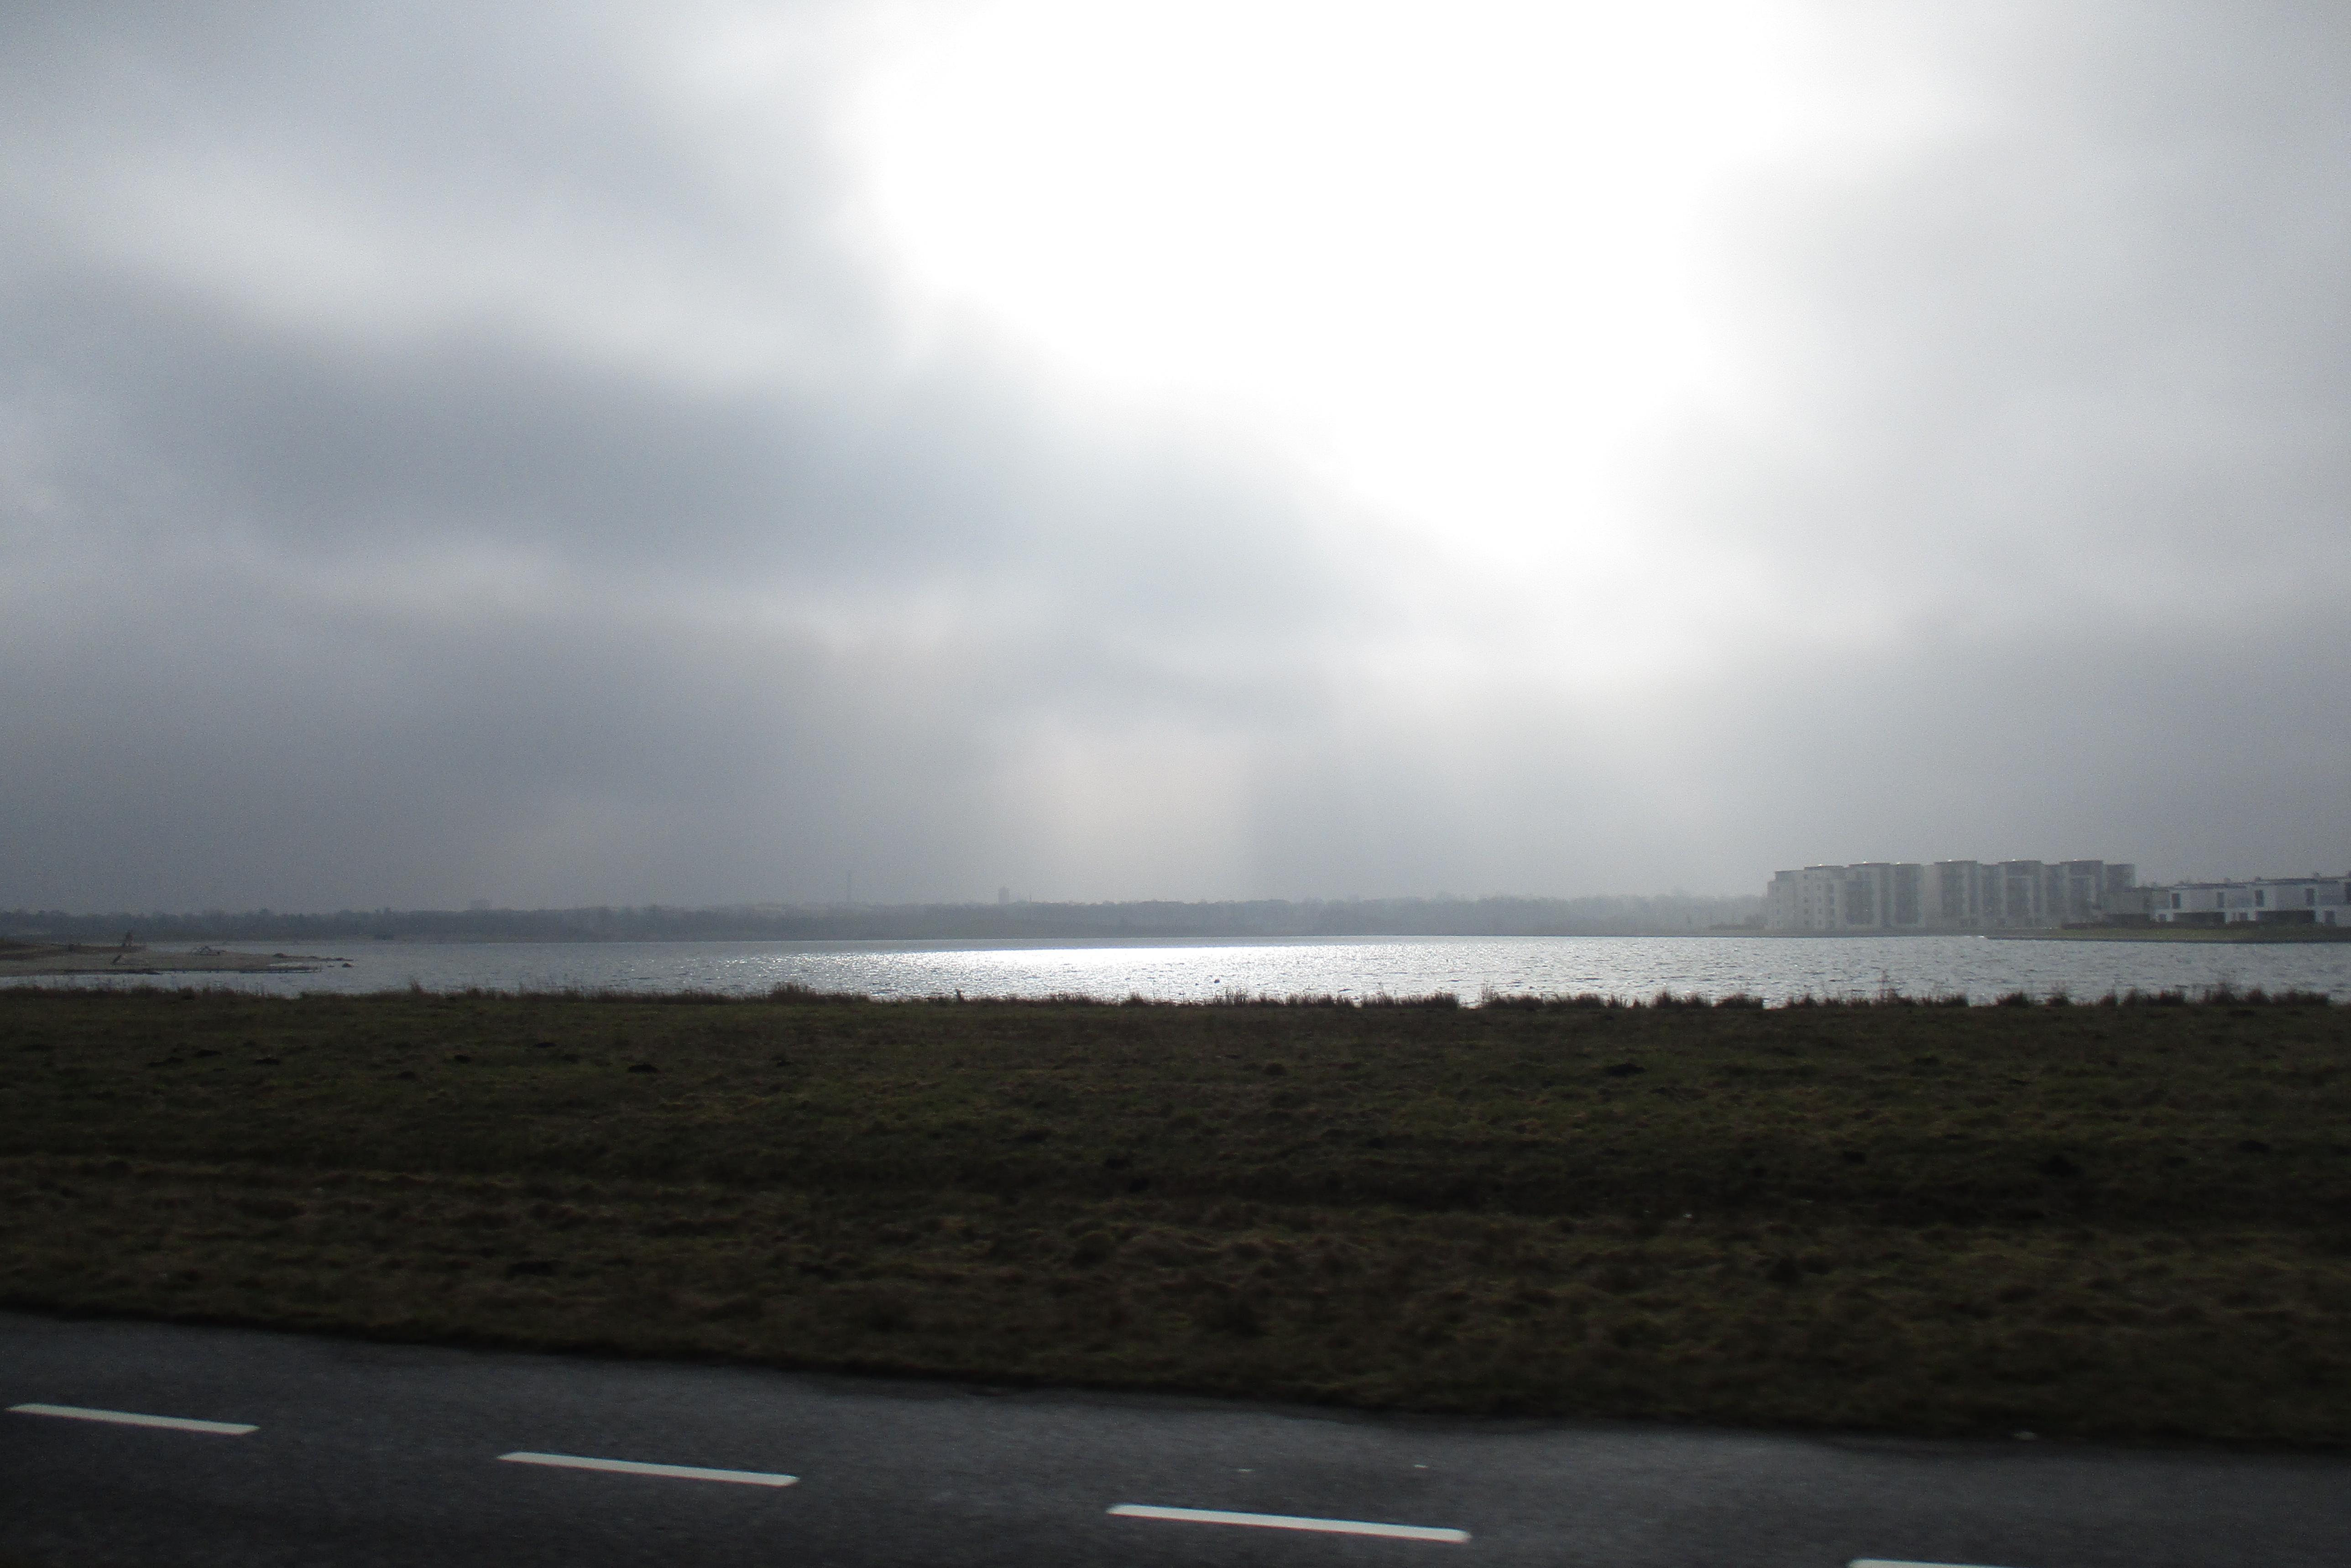 skyerherningmartswandasoerensen.jpg